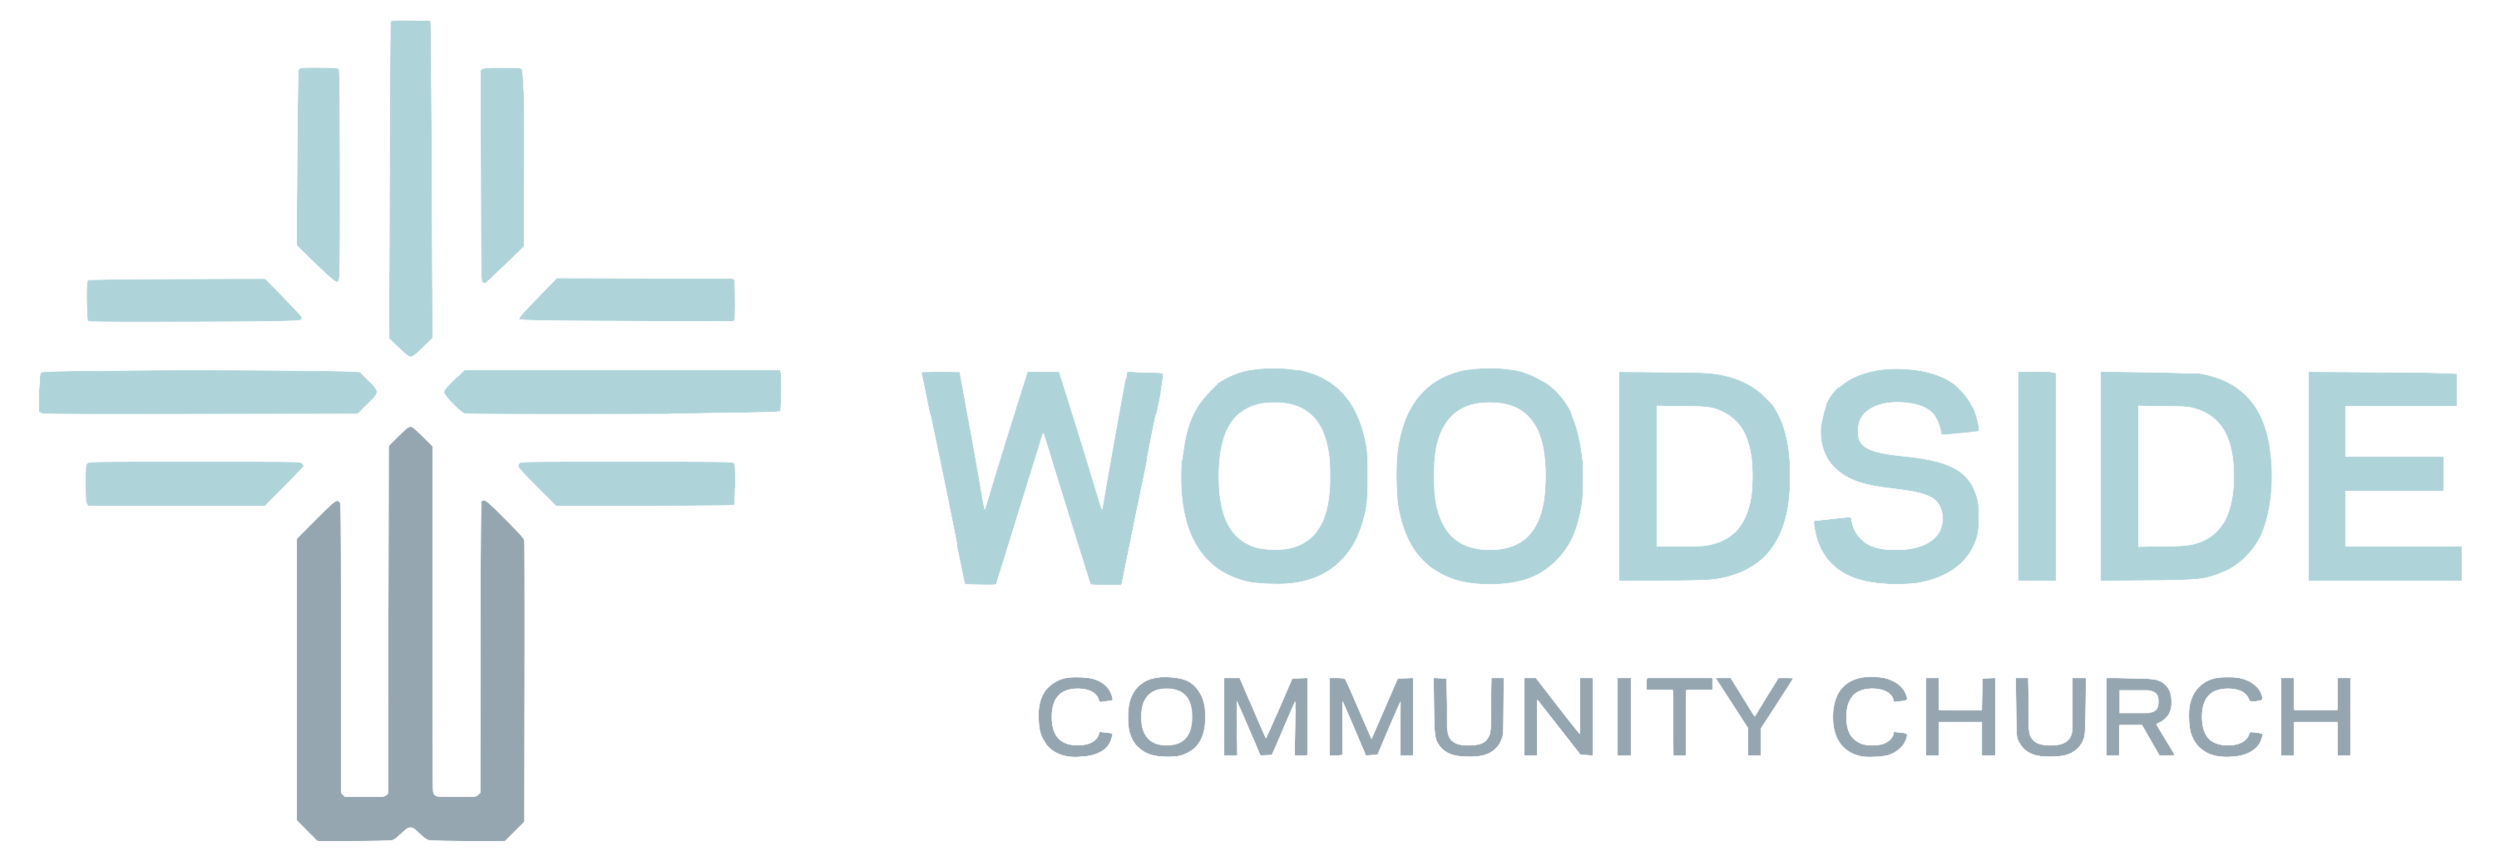 woodside_logo.png